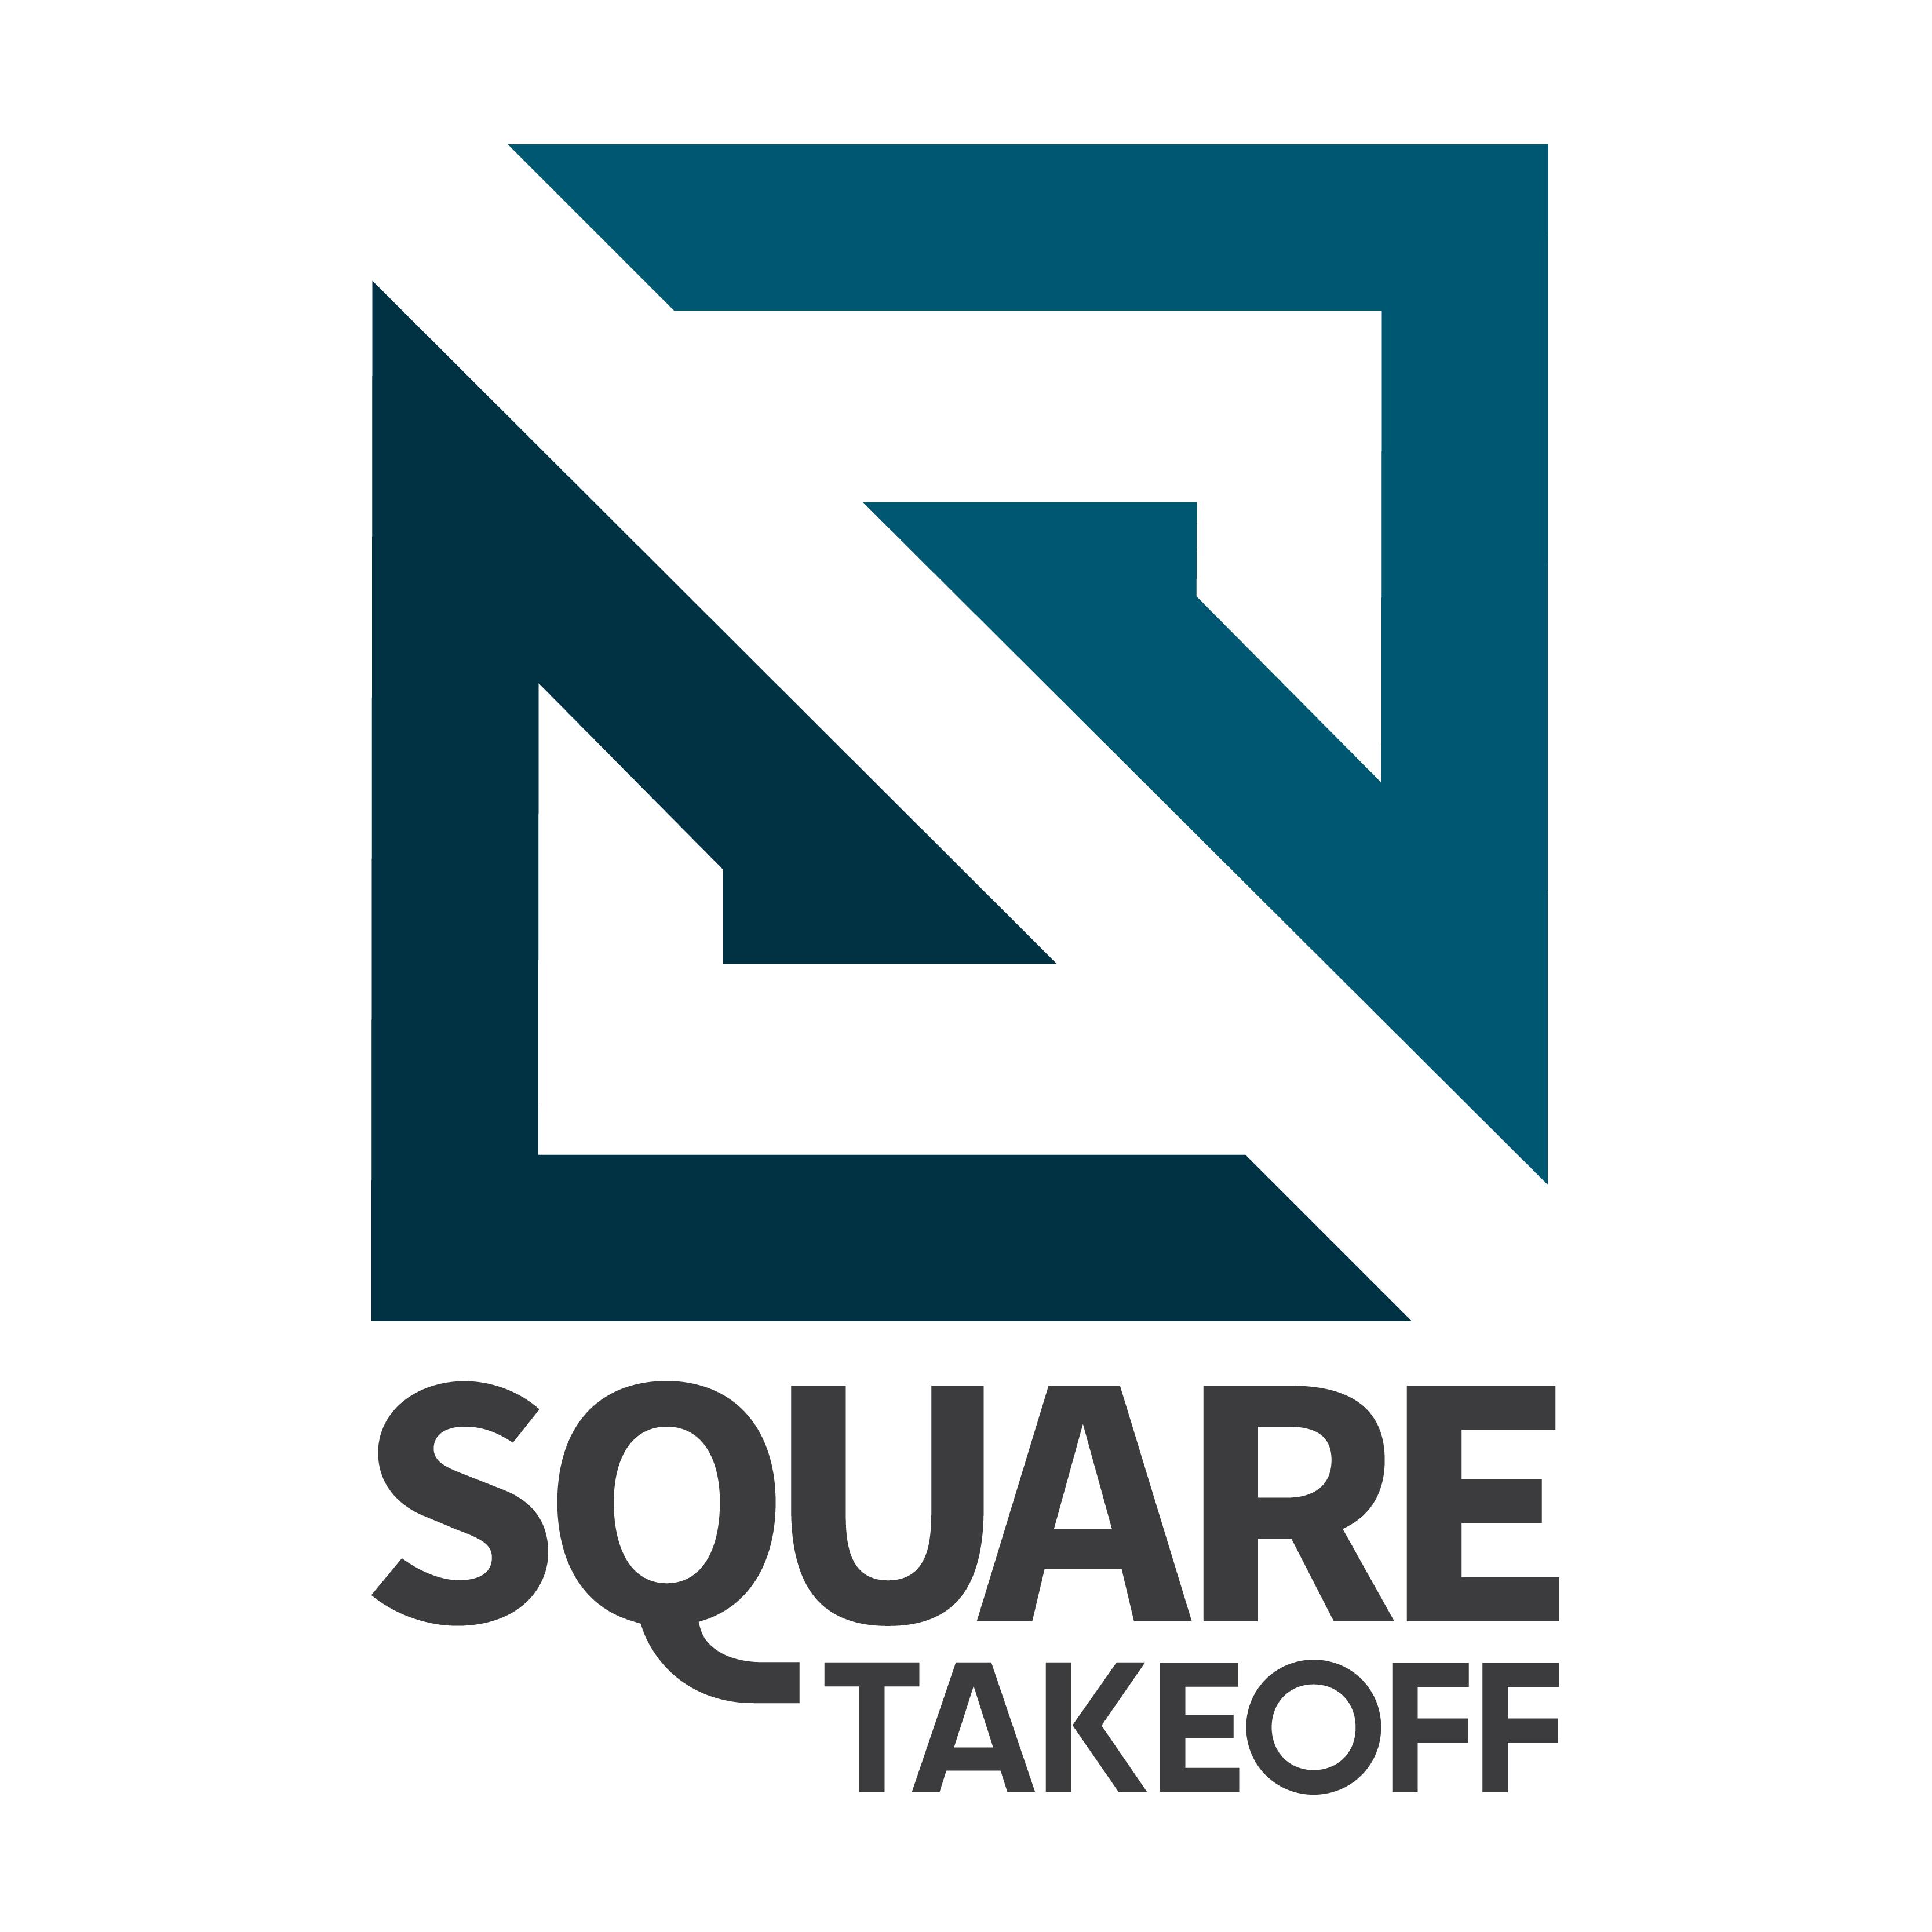 Square Takeoff logo